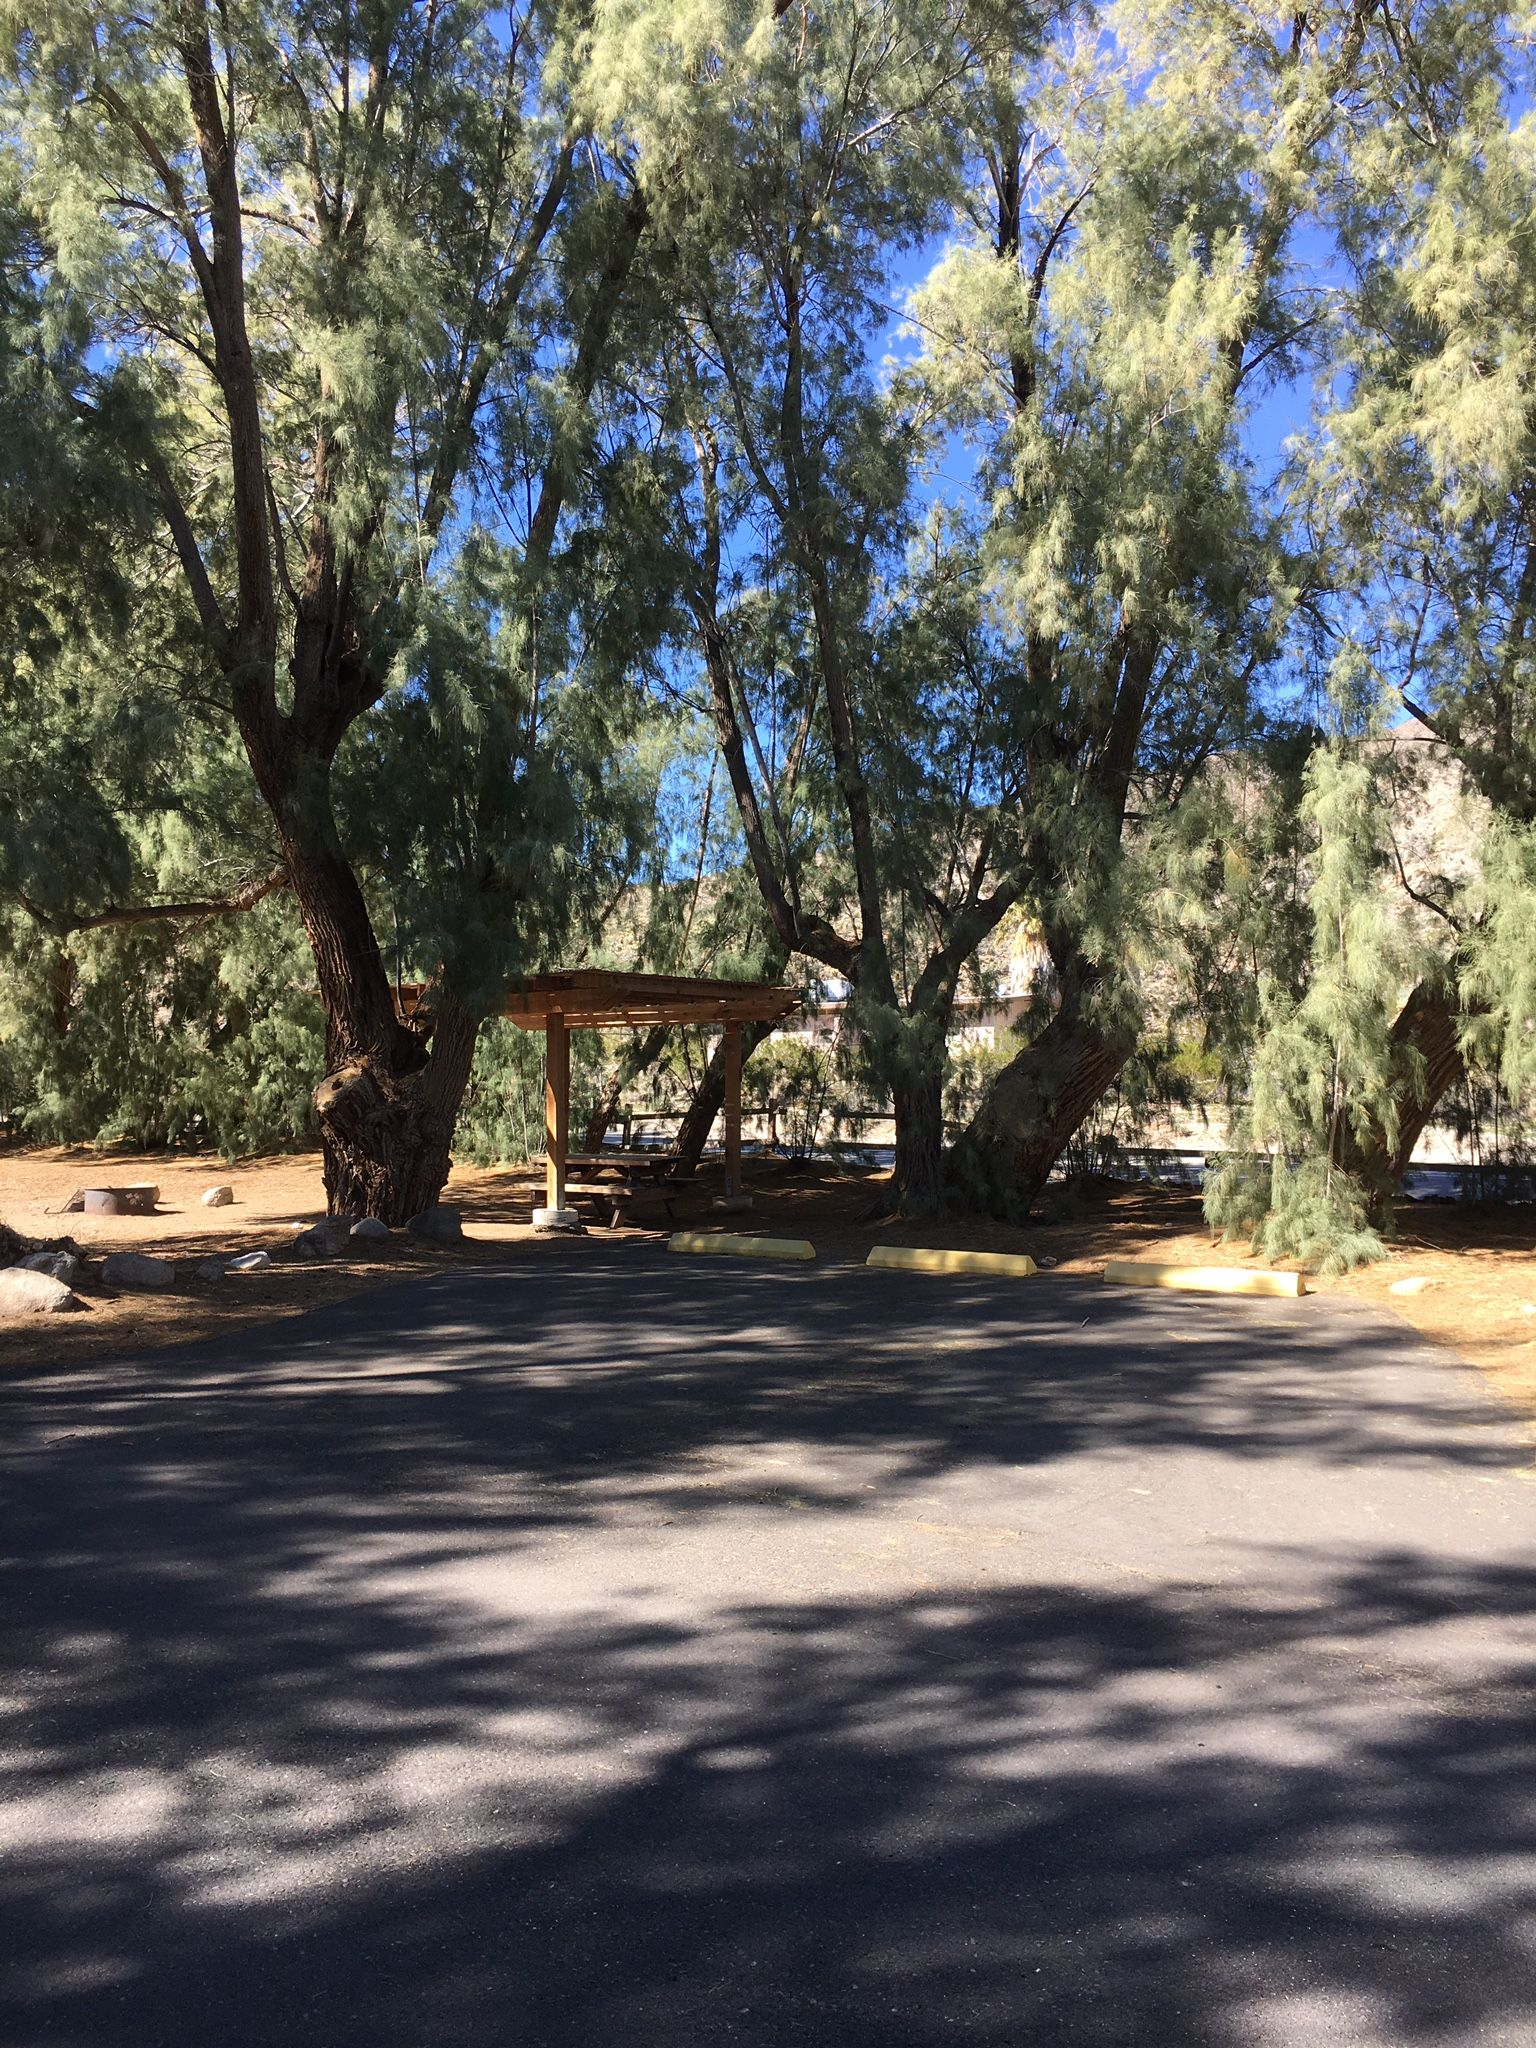 Tamarisk Grove Campground Anza Borrego State Park